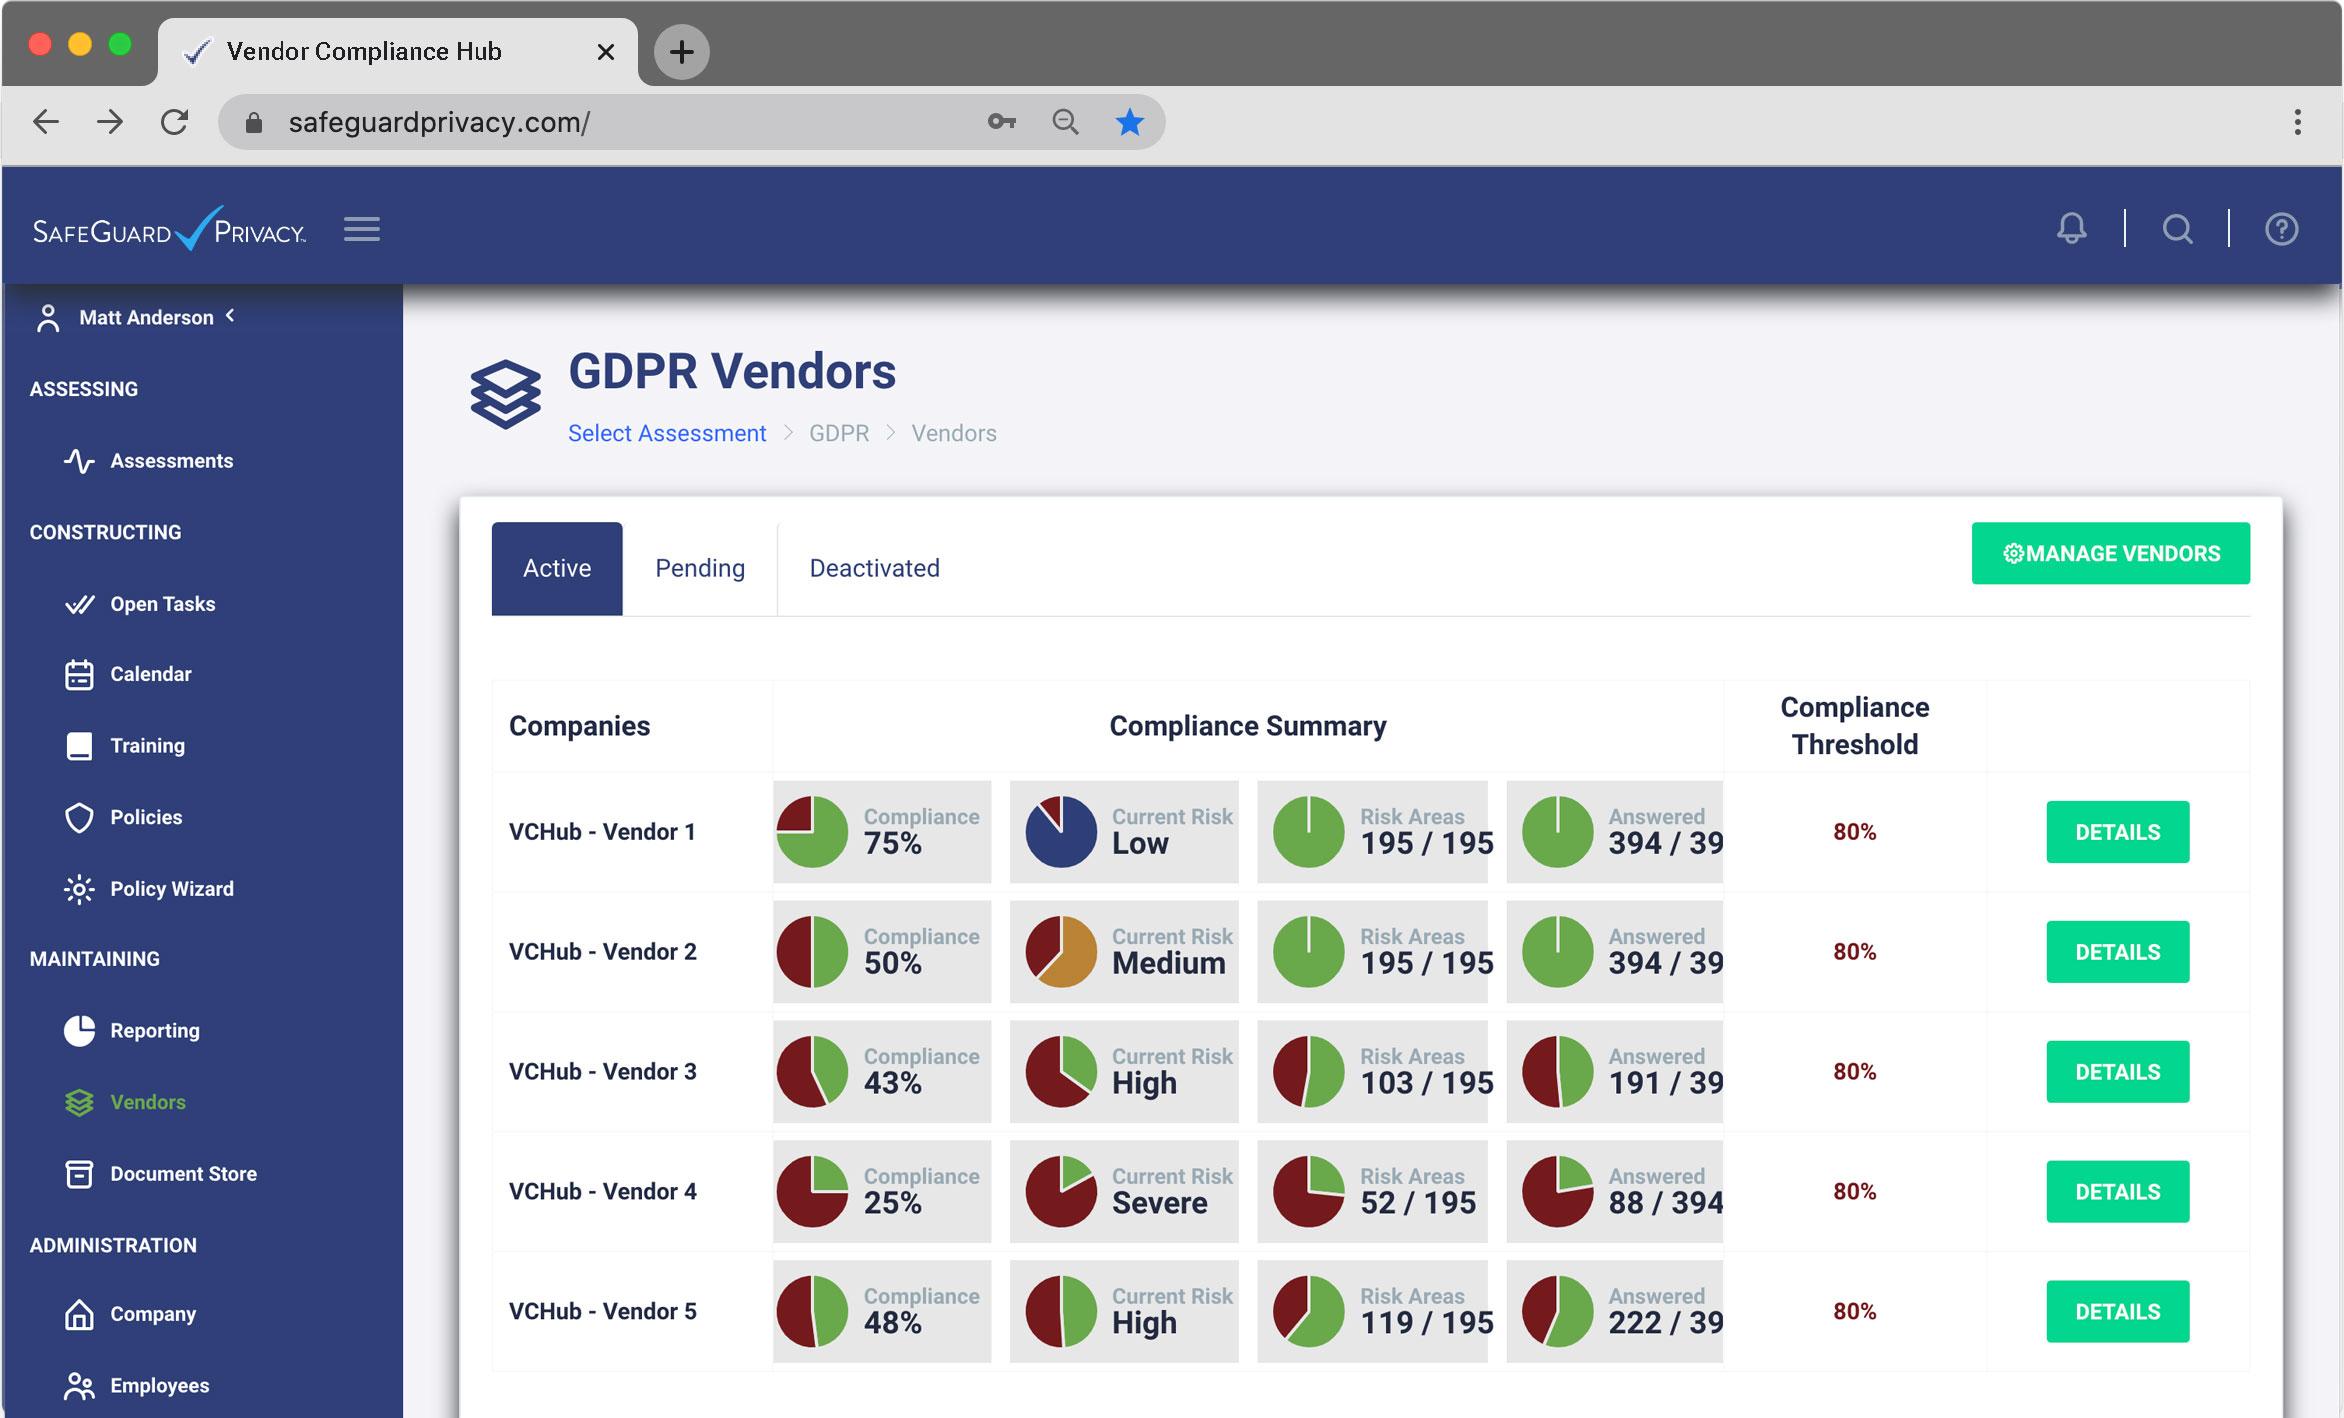 Vendor Compliance Hub